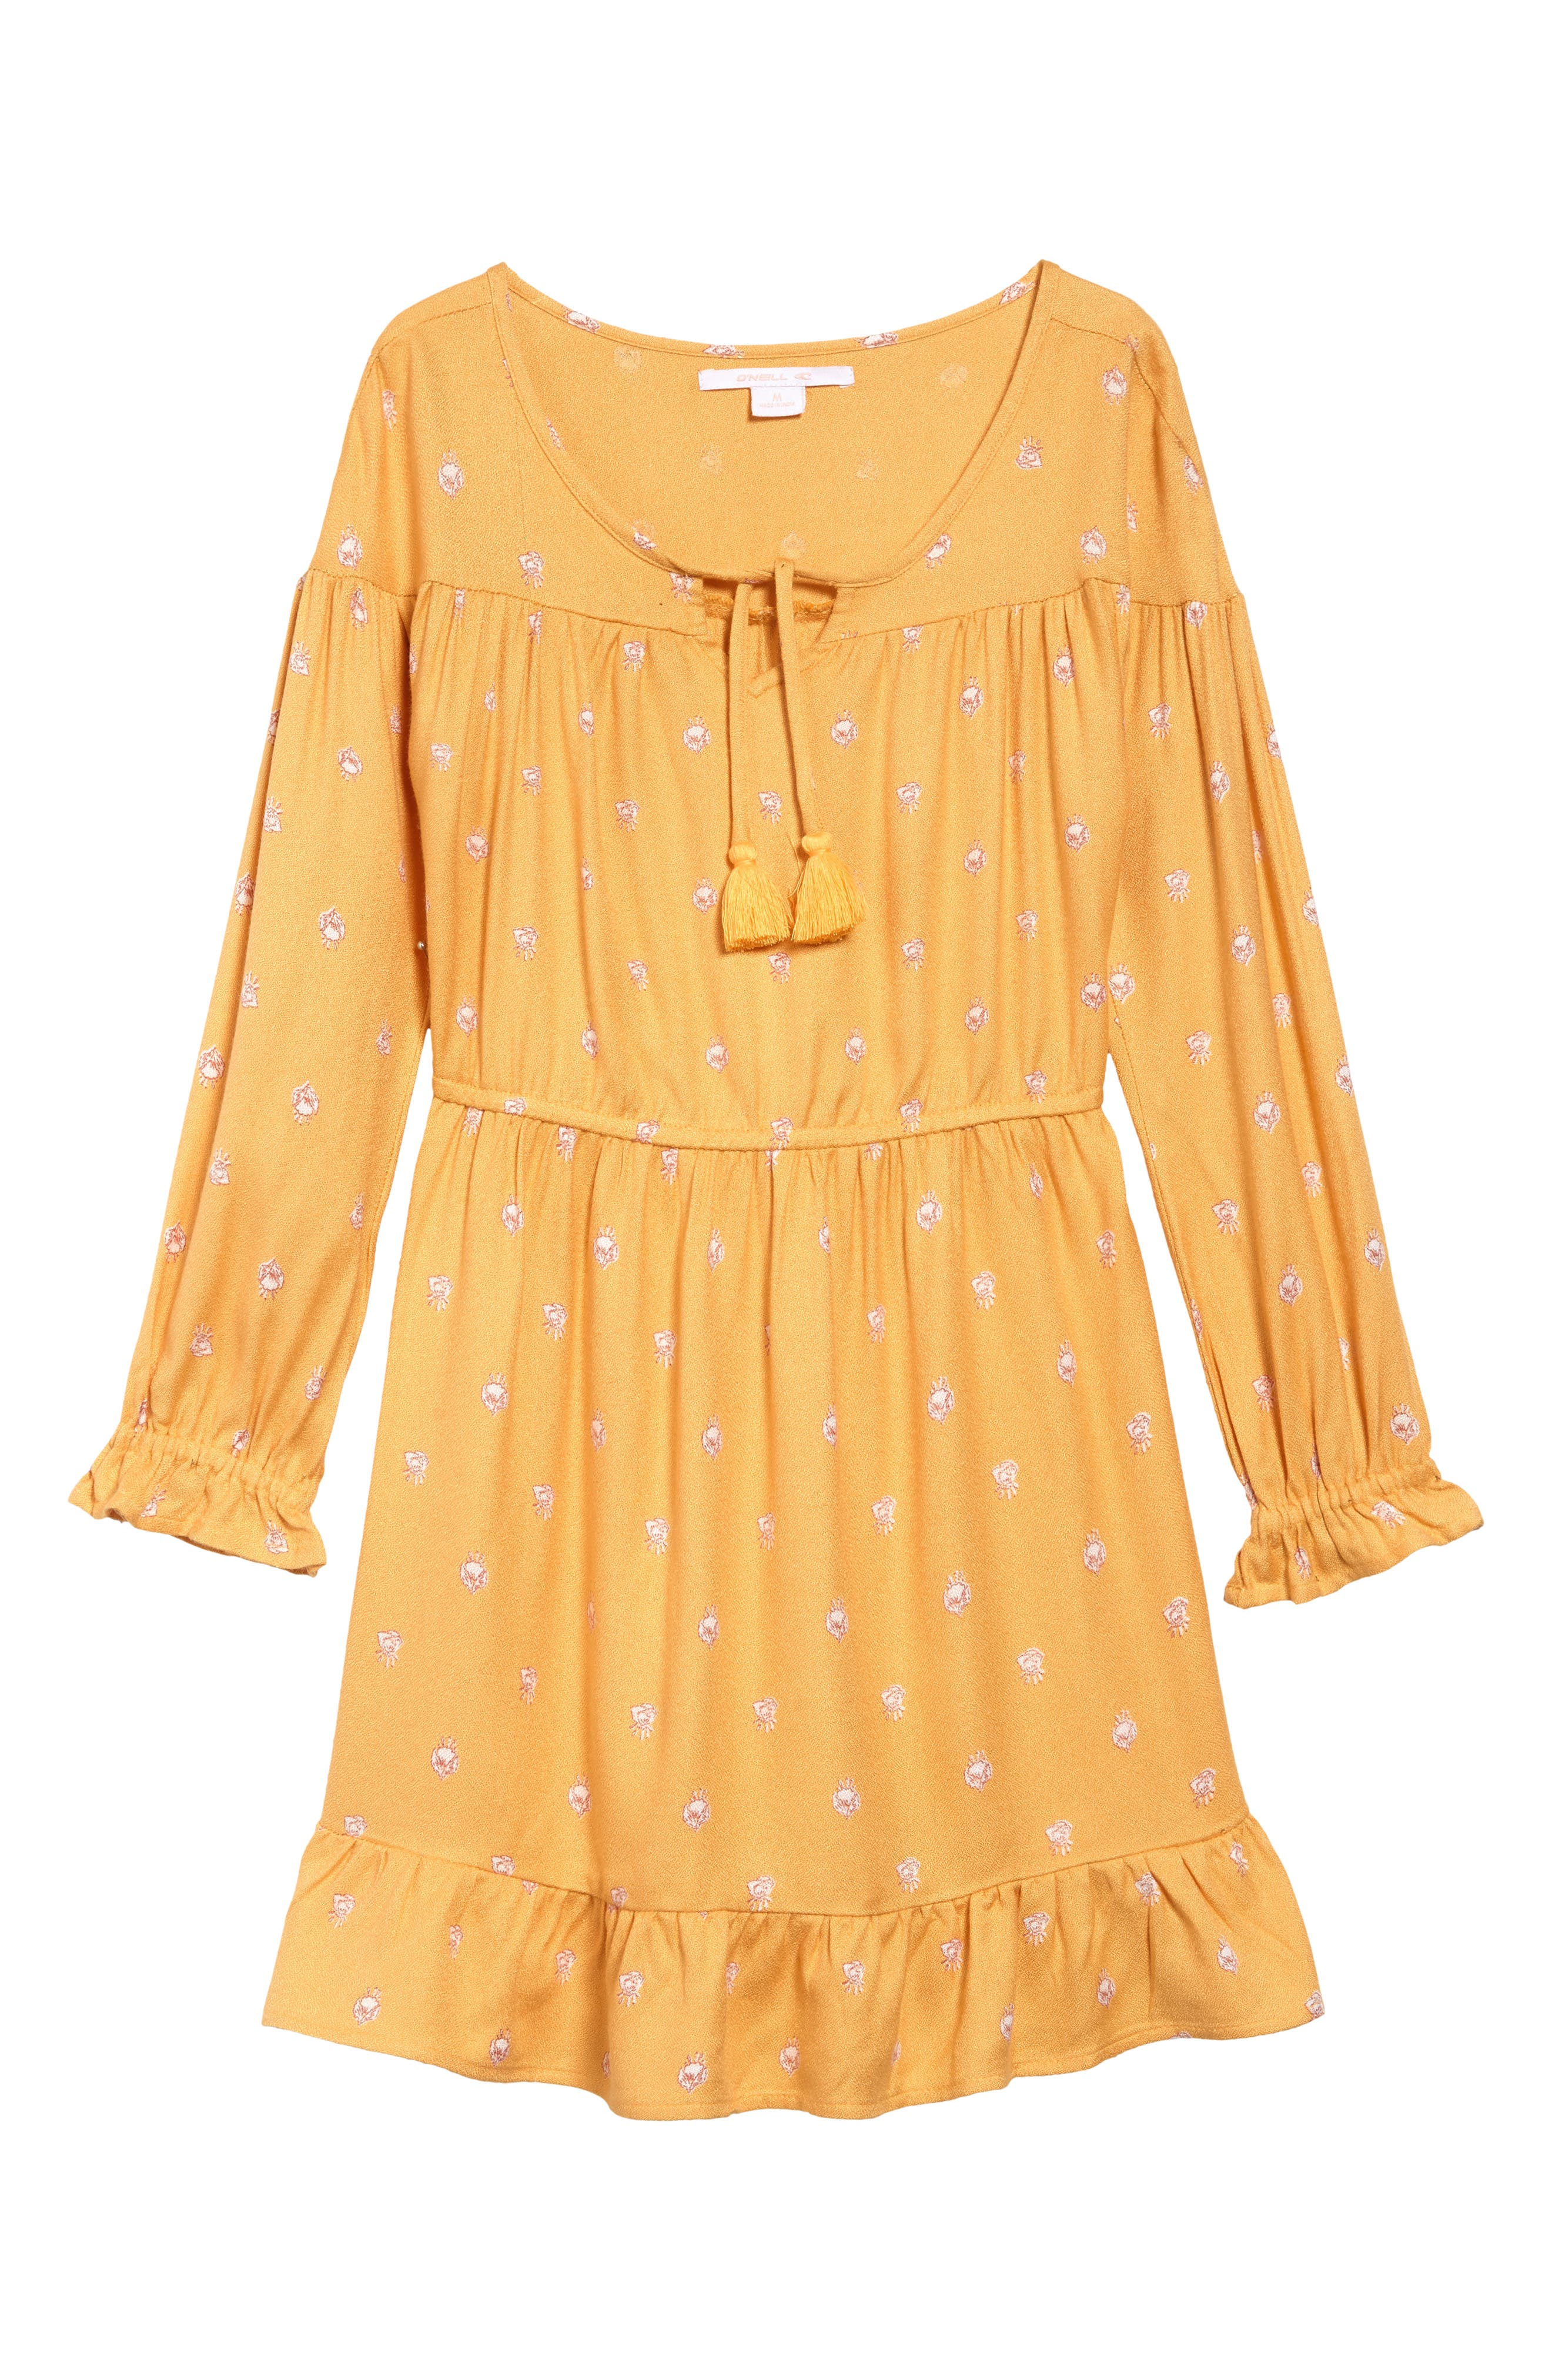 Image of O'Neill Emilia Woven Dress